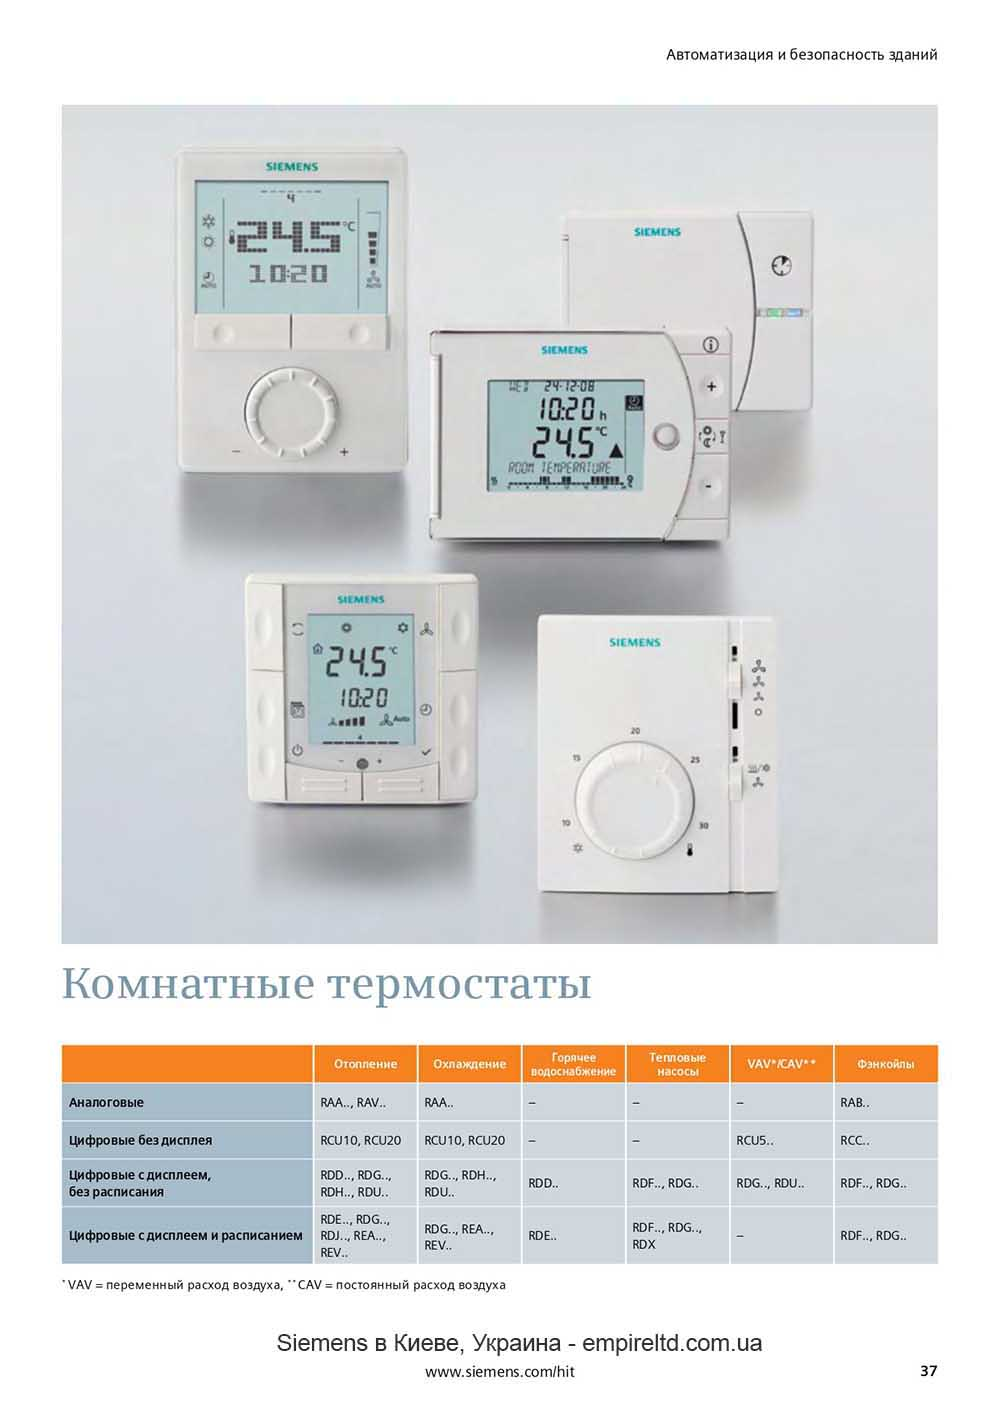 siemens-kiev-ukraine-0020-2